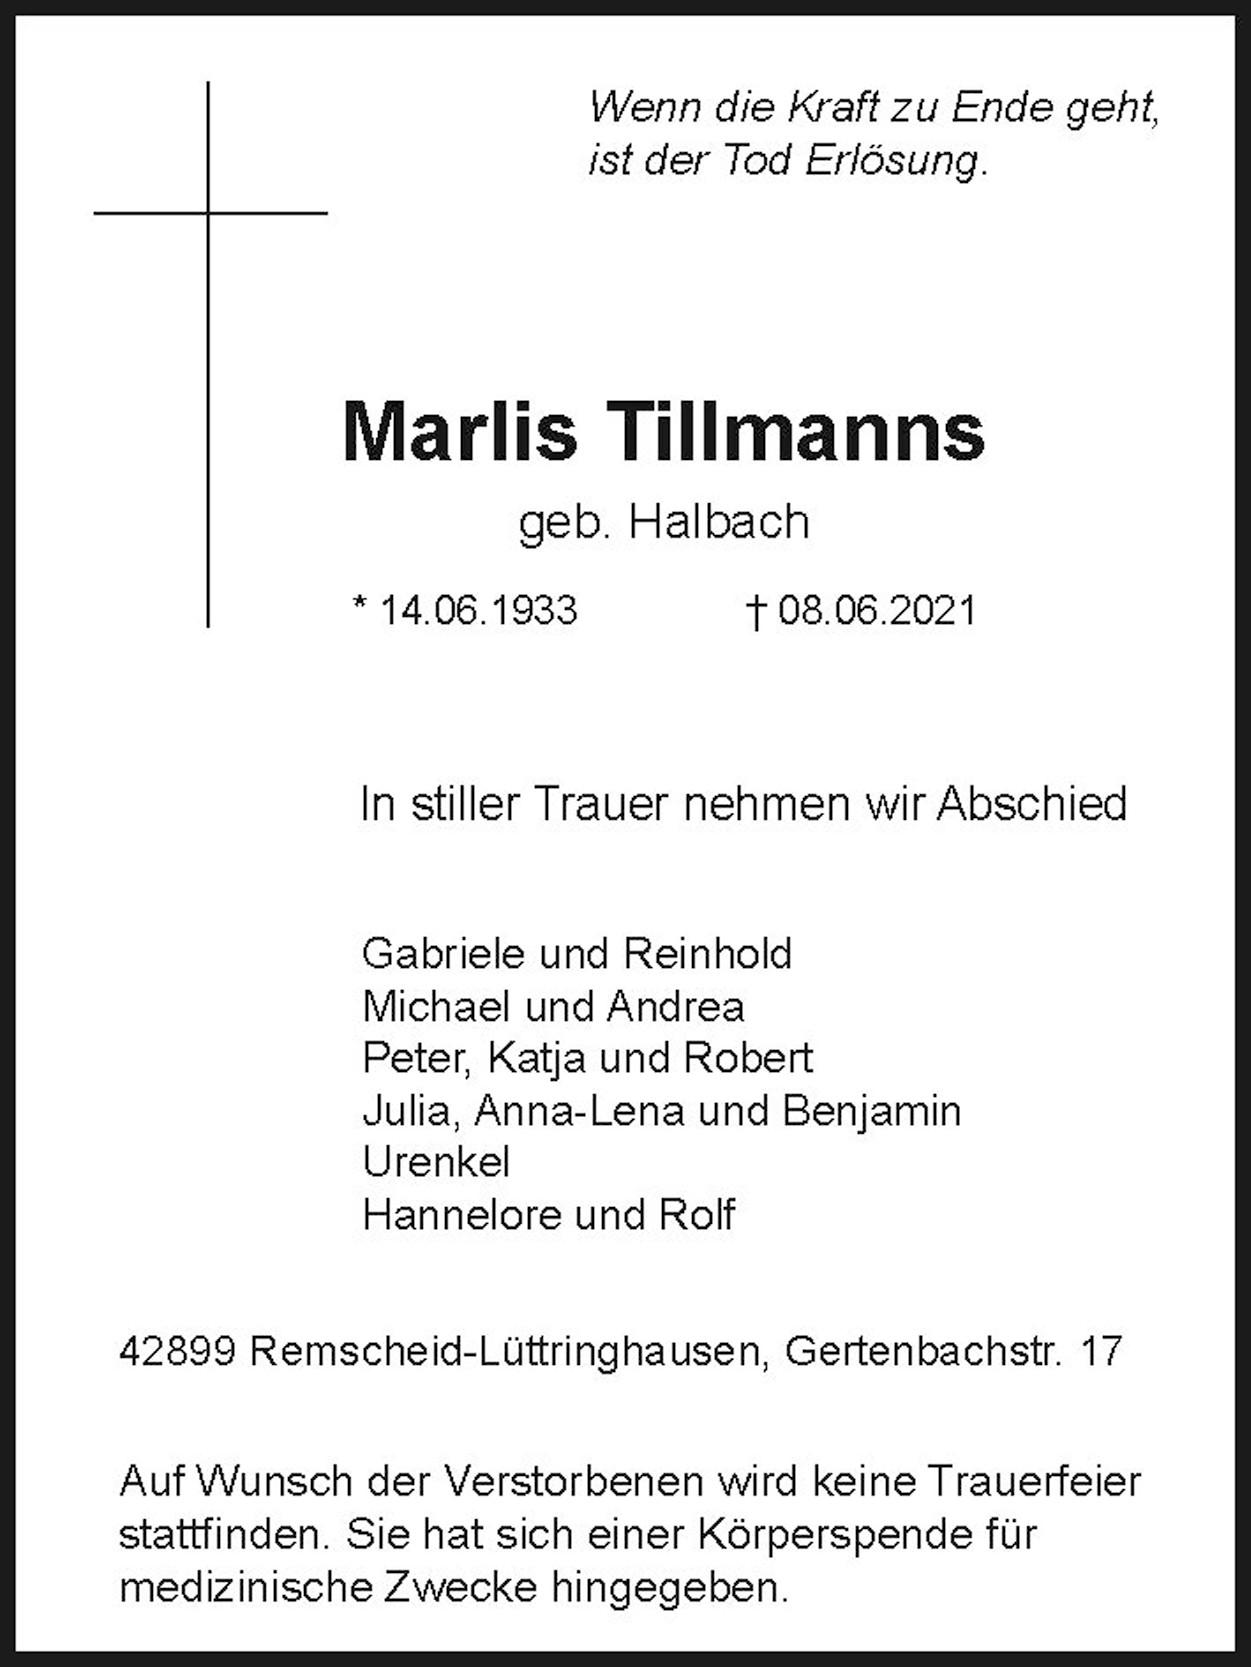 Marlis Tillmanns